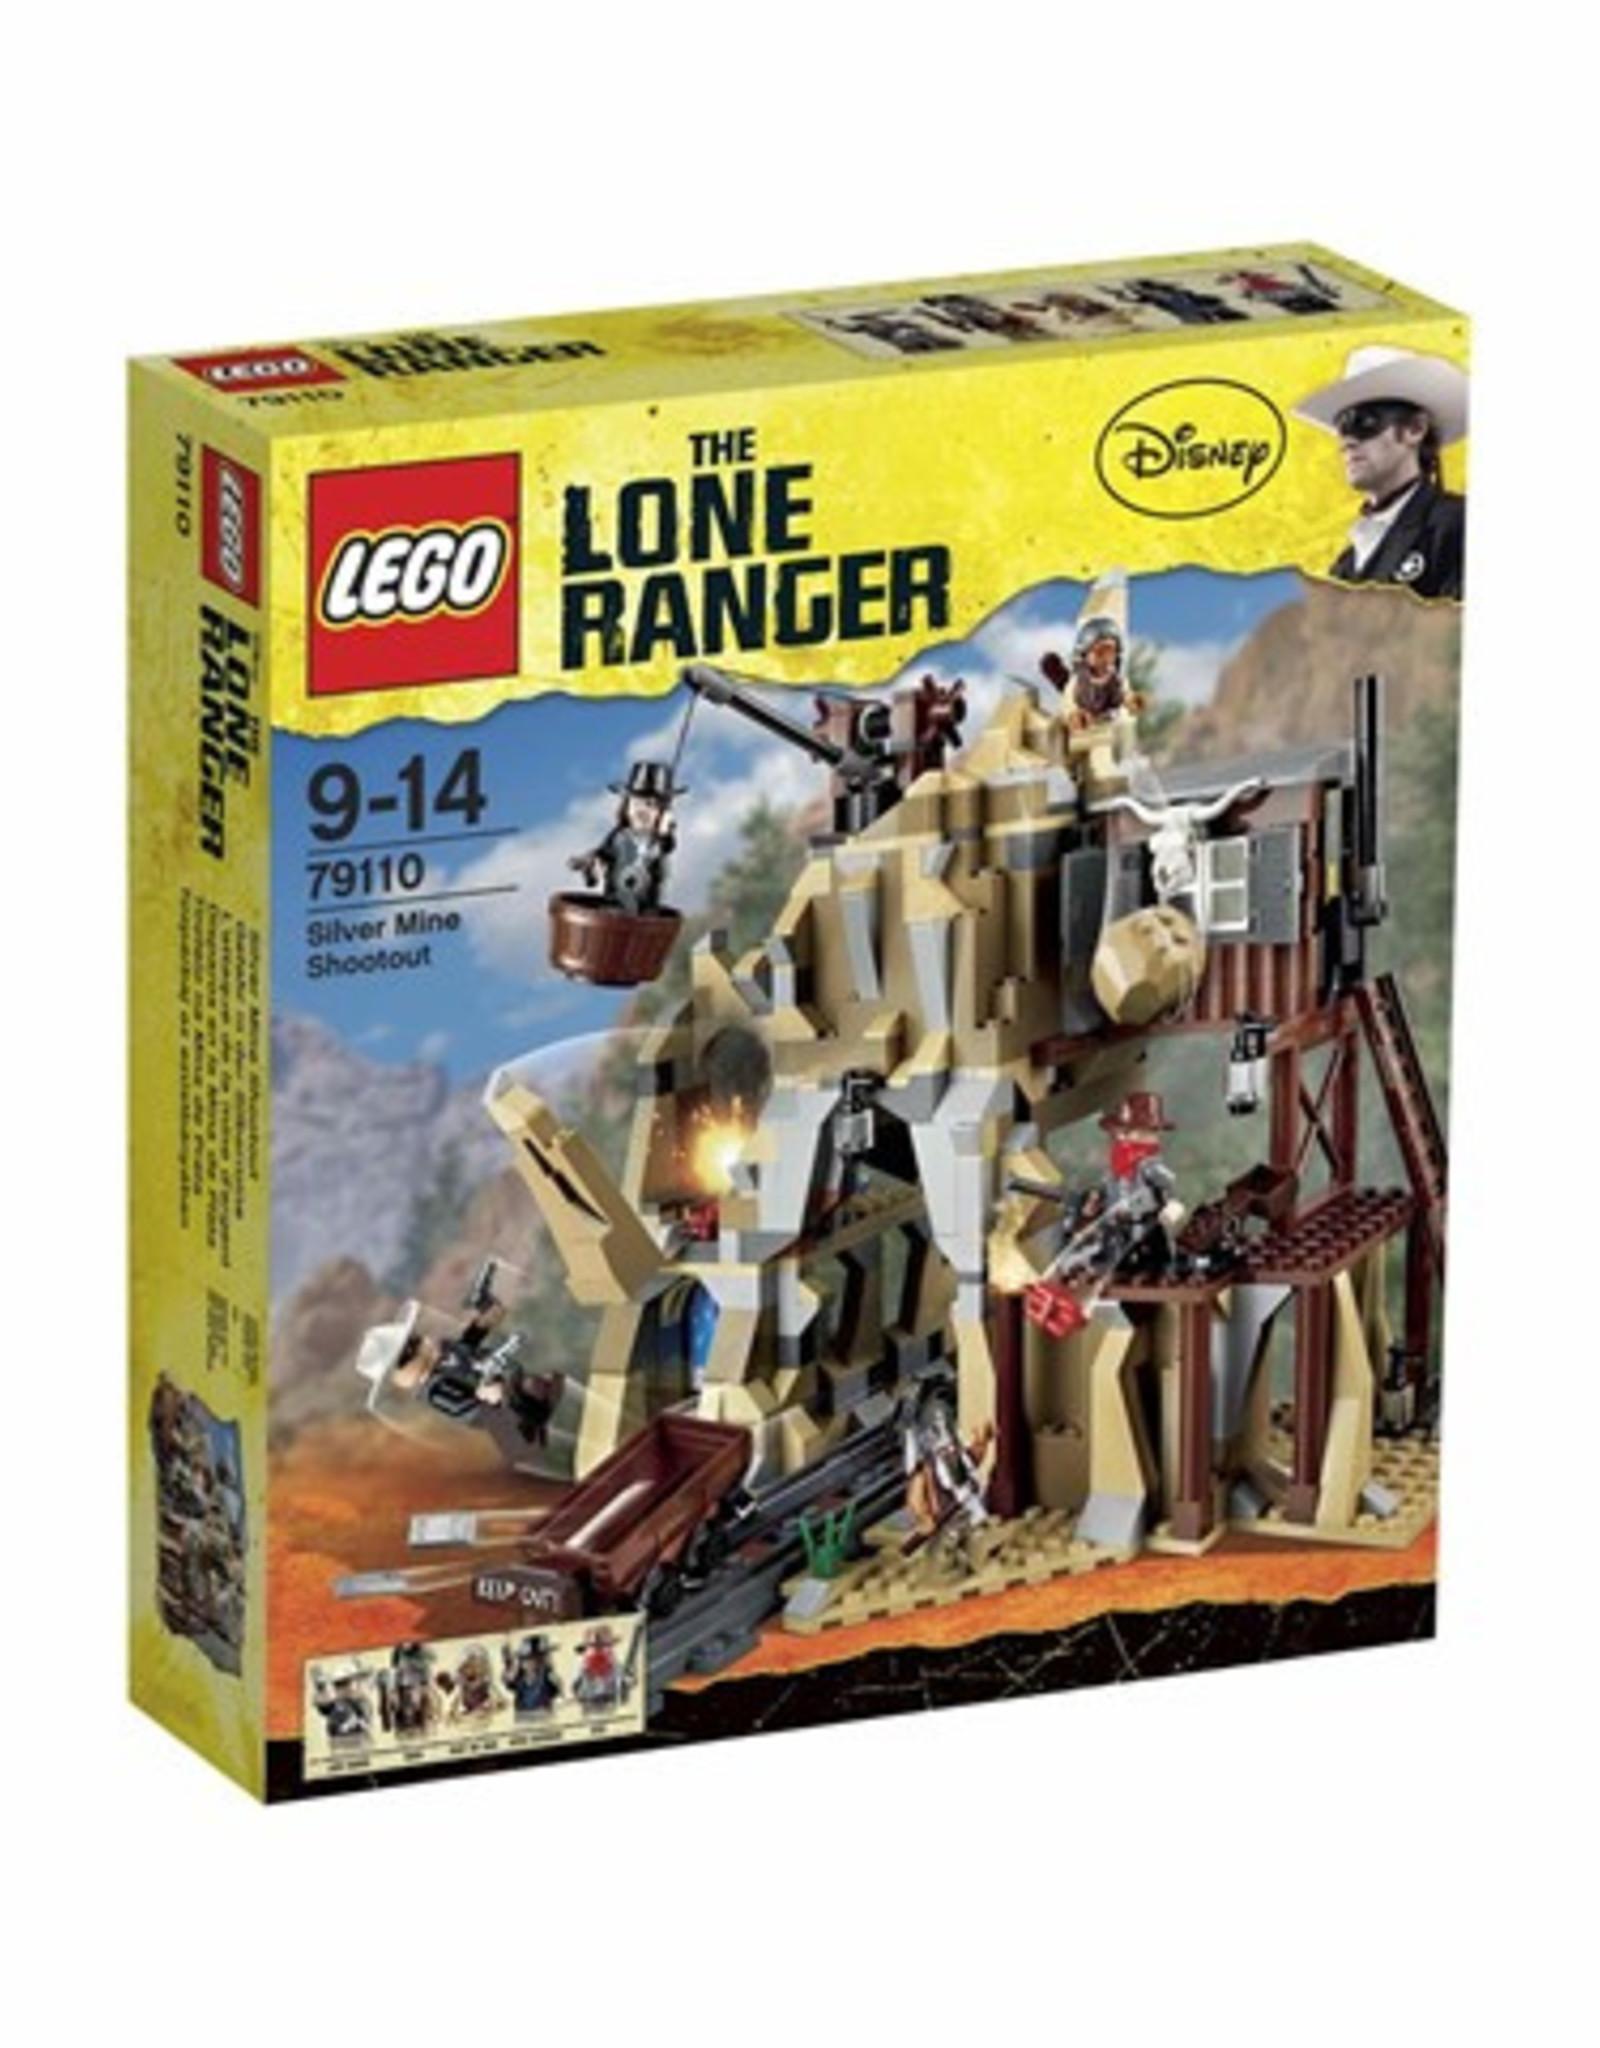 LEGO LEGO 79110 Silver Mine Shootout LONE RANGER